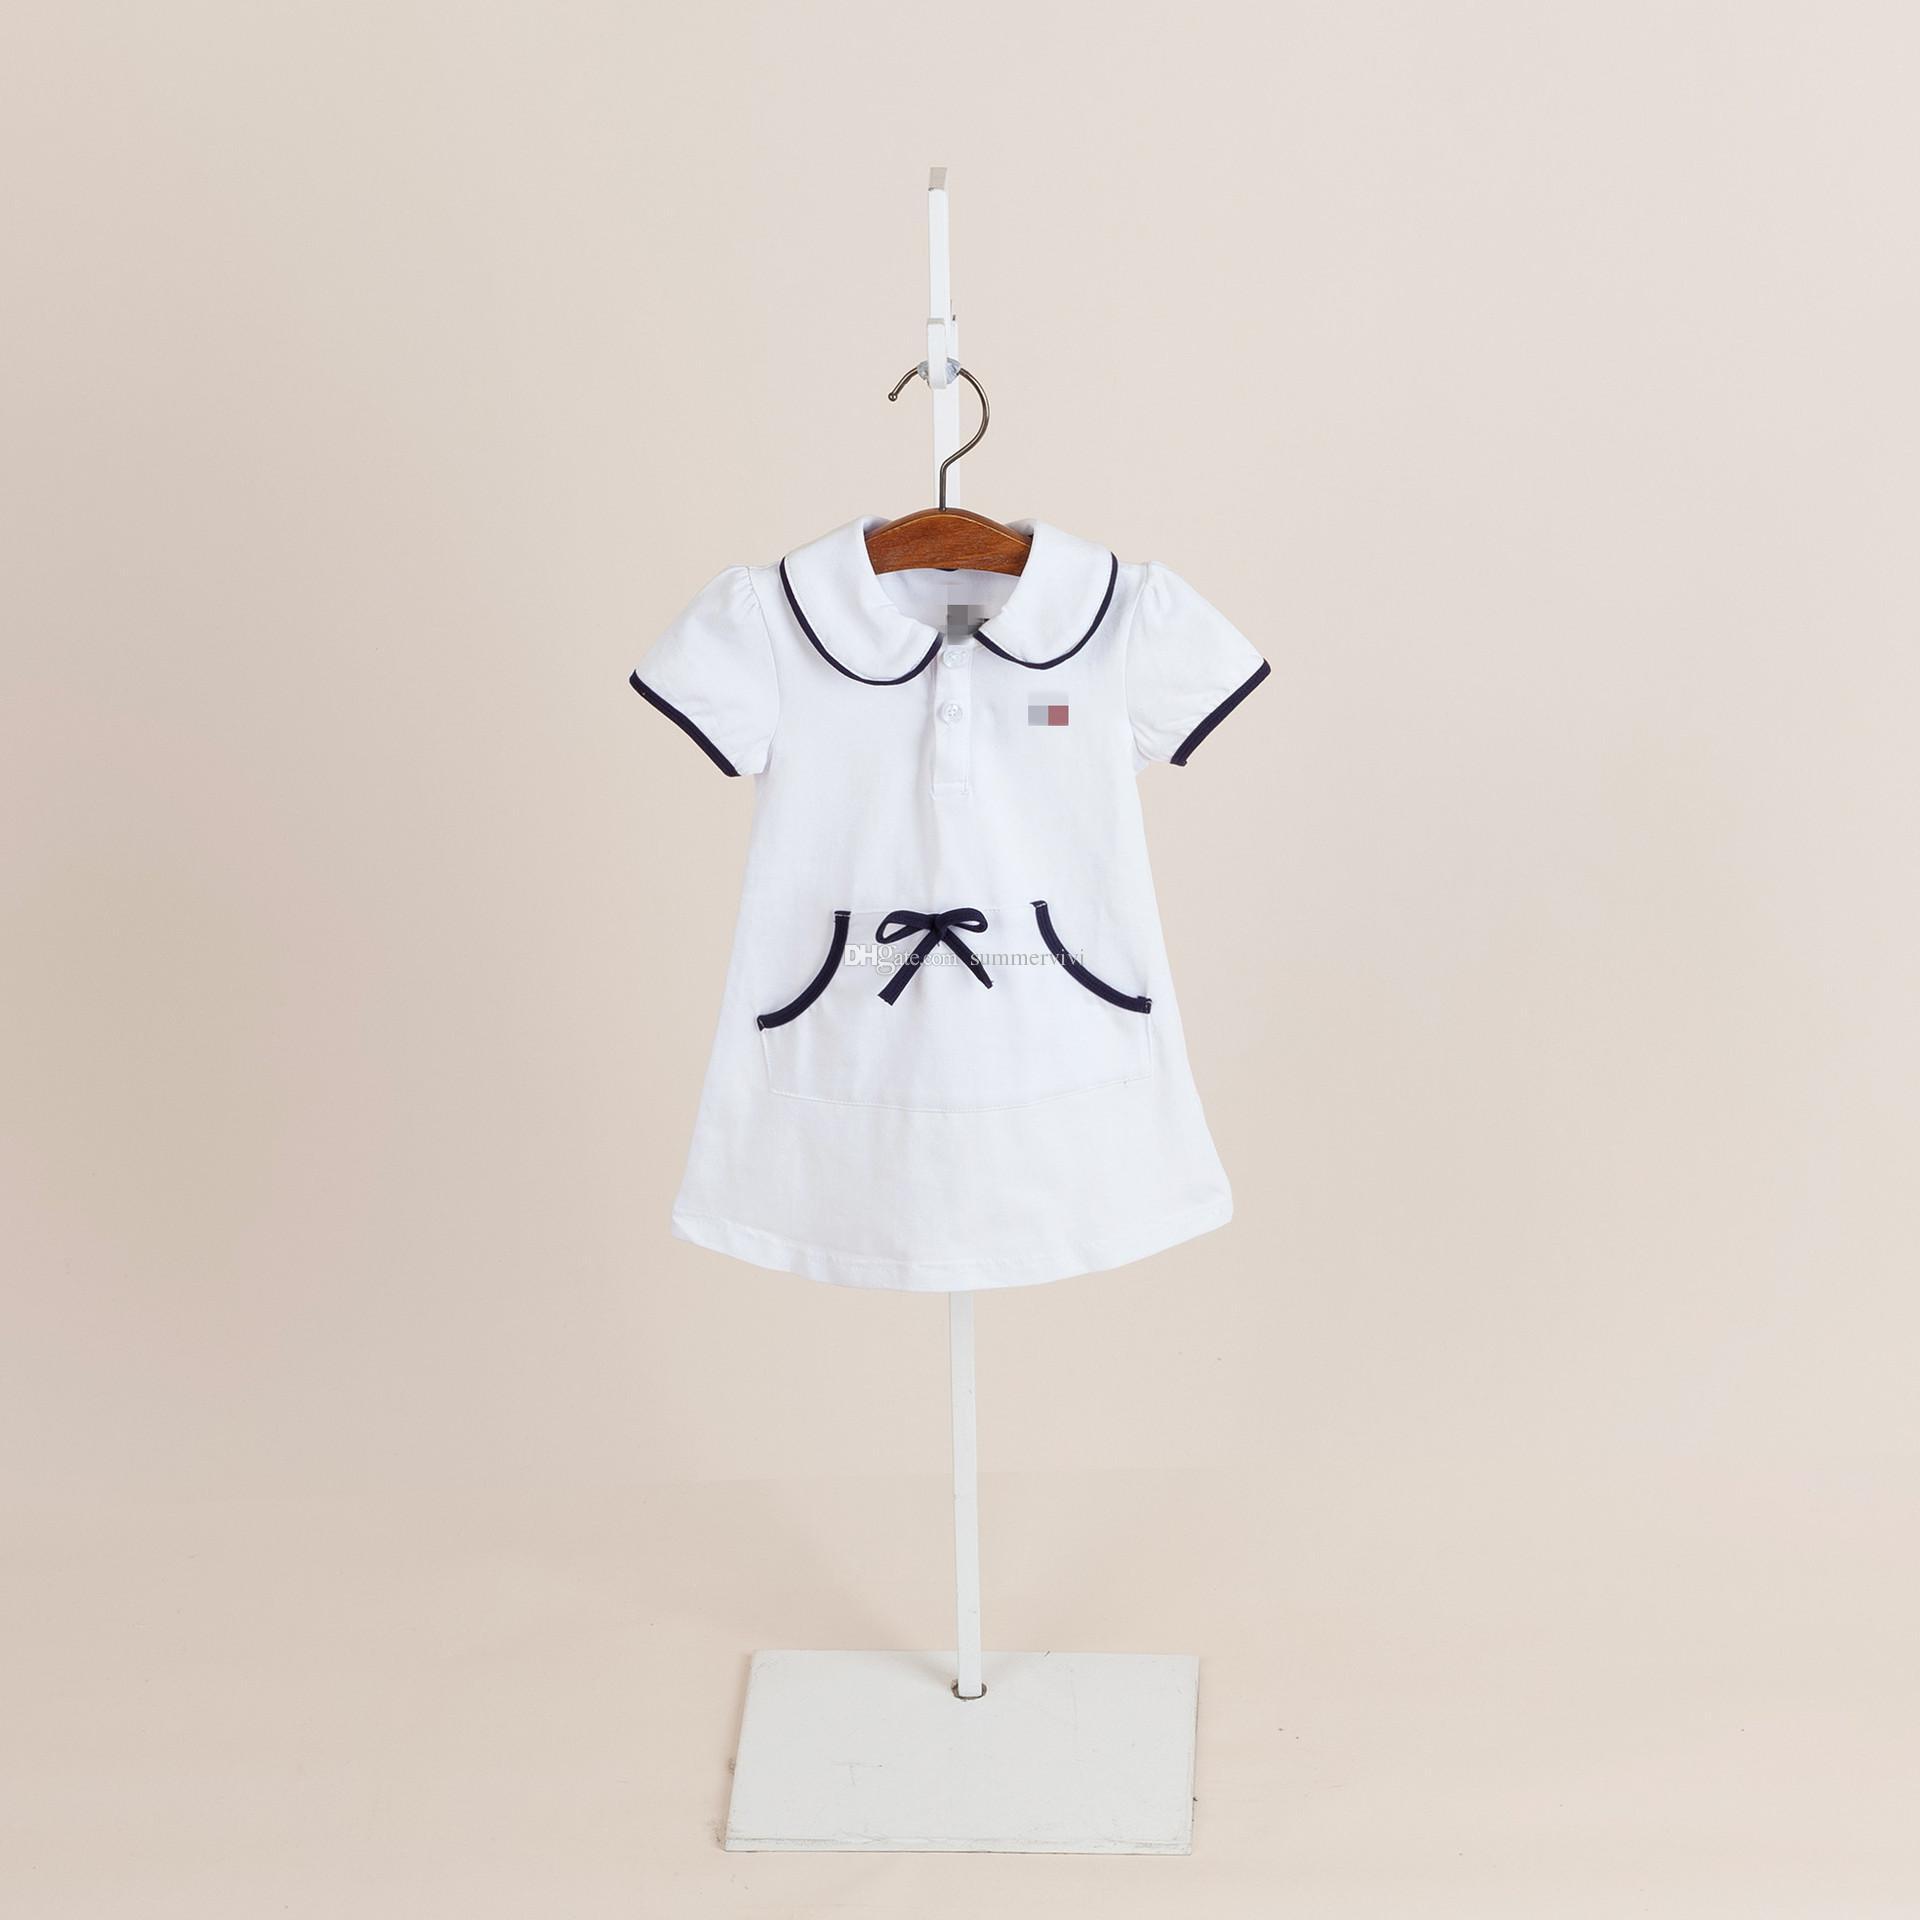 c4a673601 2019 New Baby Girls Summer Dresses Designer Kids Lapel Short Sleeve ...